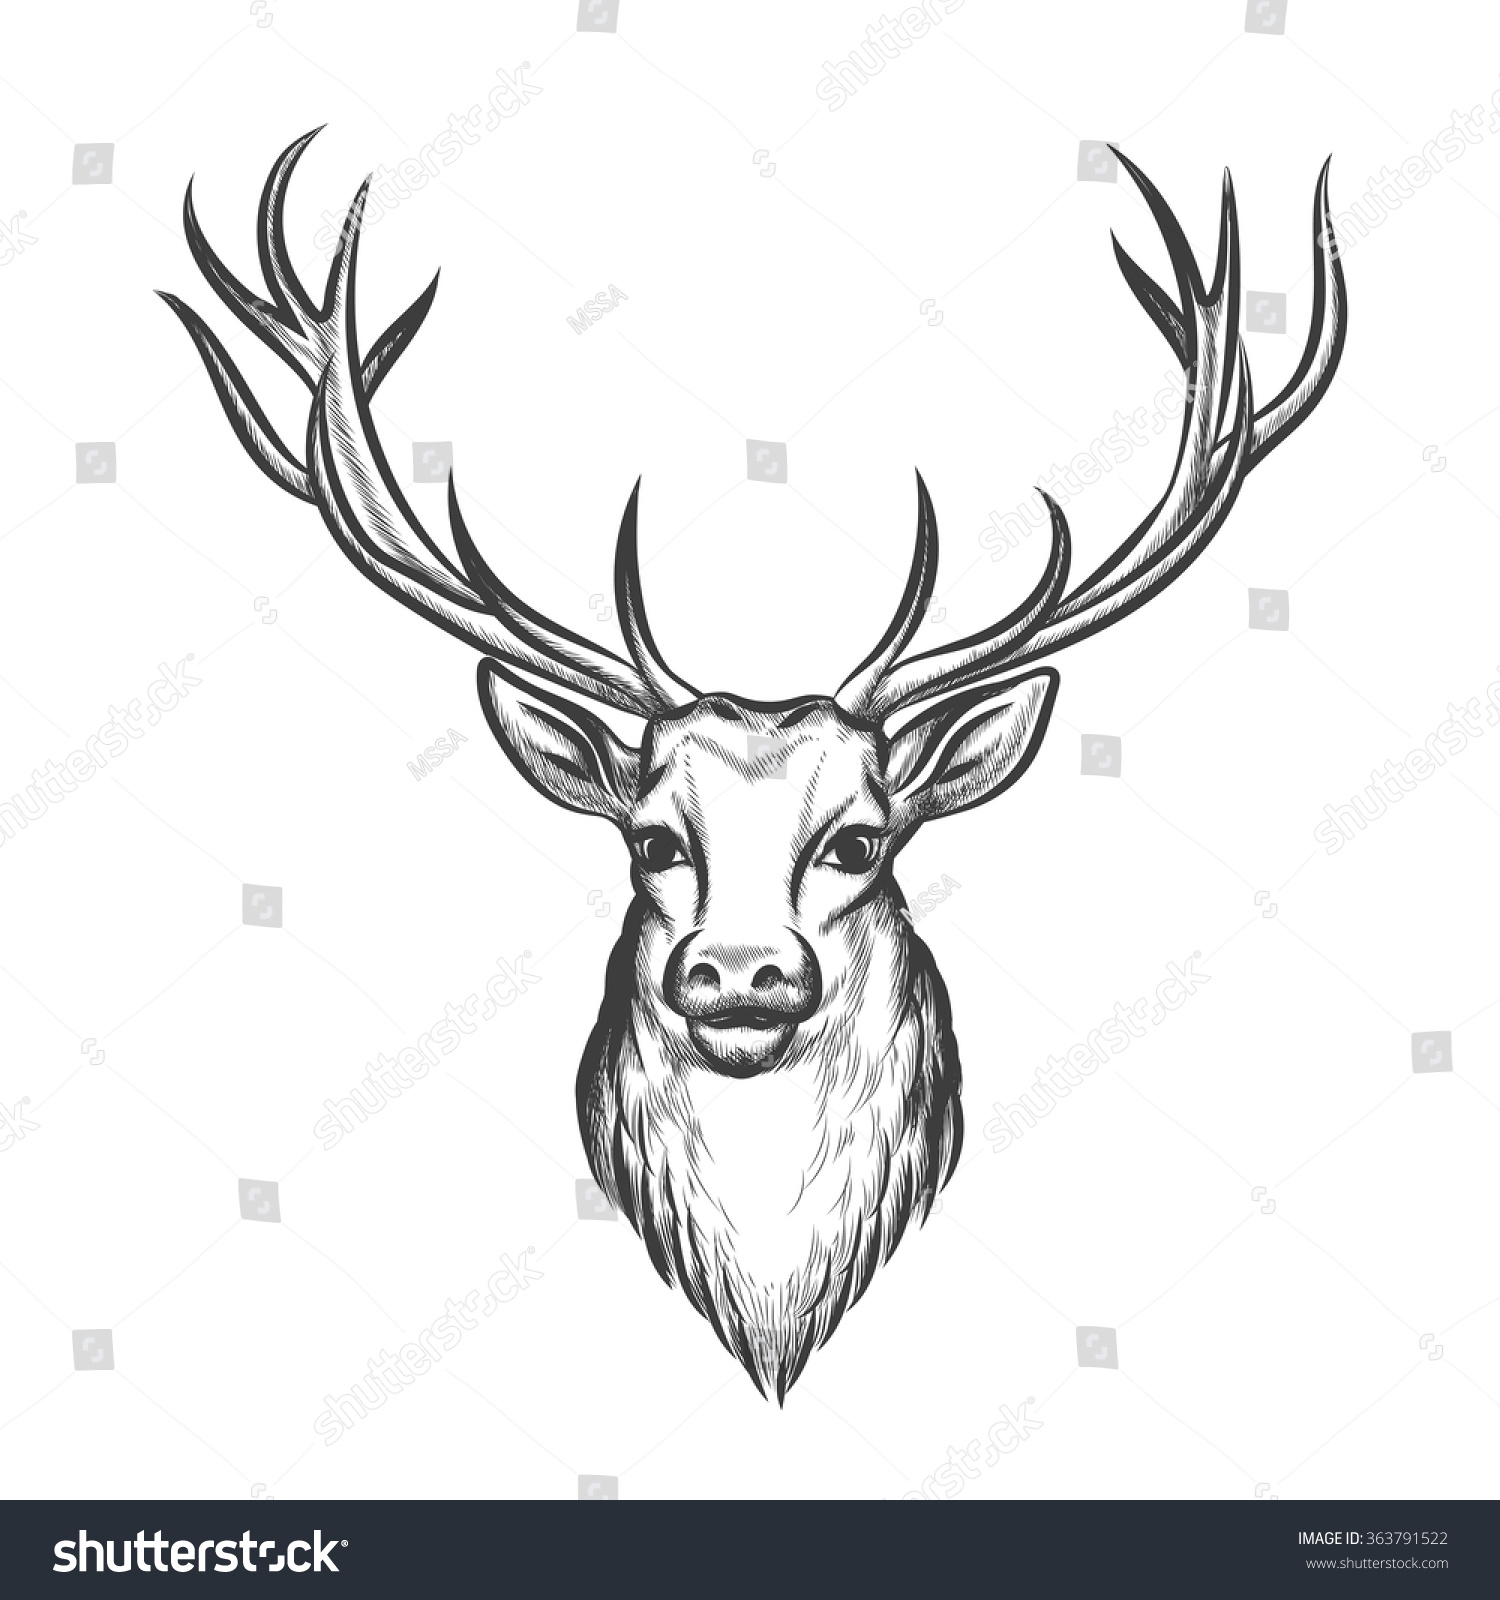 Hand Drawn Deer Head Wild Animal Stock Vector 363791522 ...